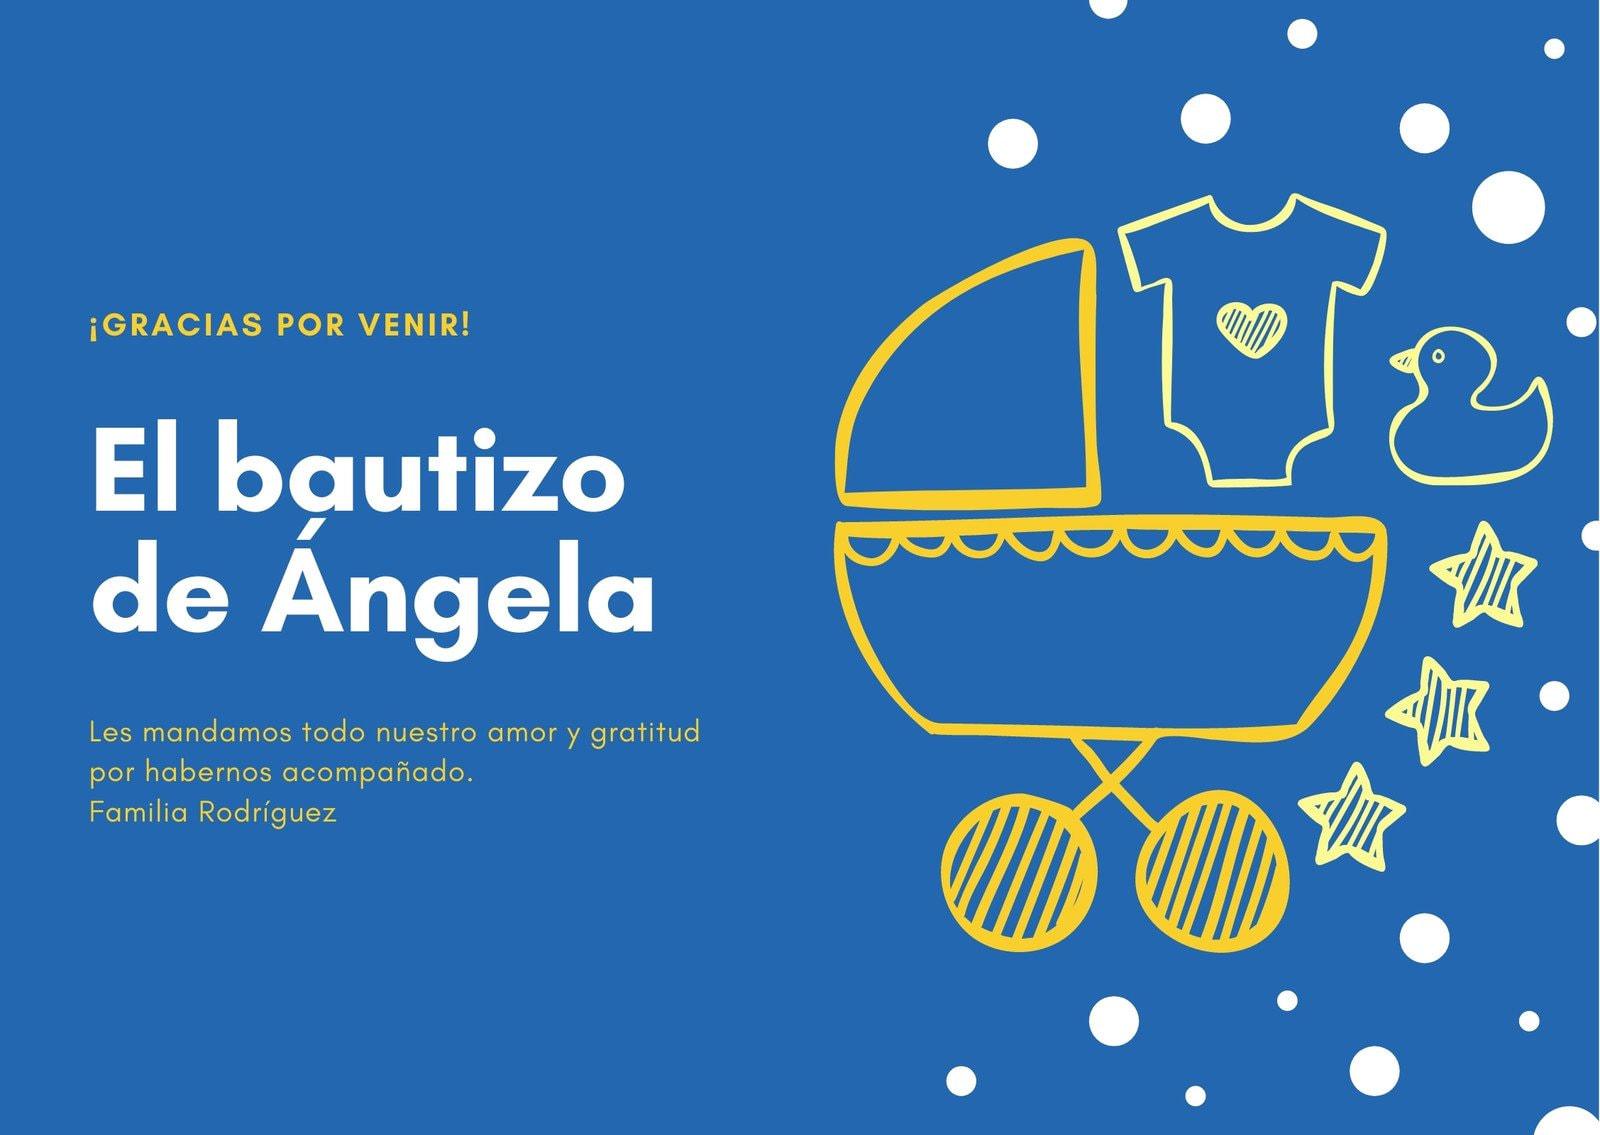 Azul Carriola Bautizo Agradecimiento Tarjeta